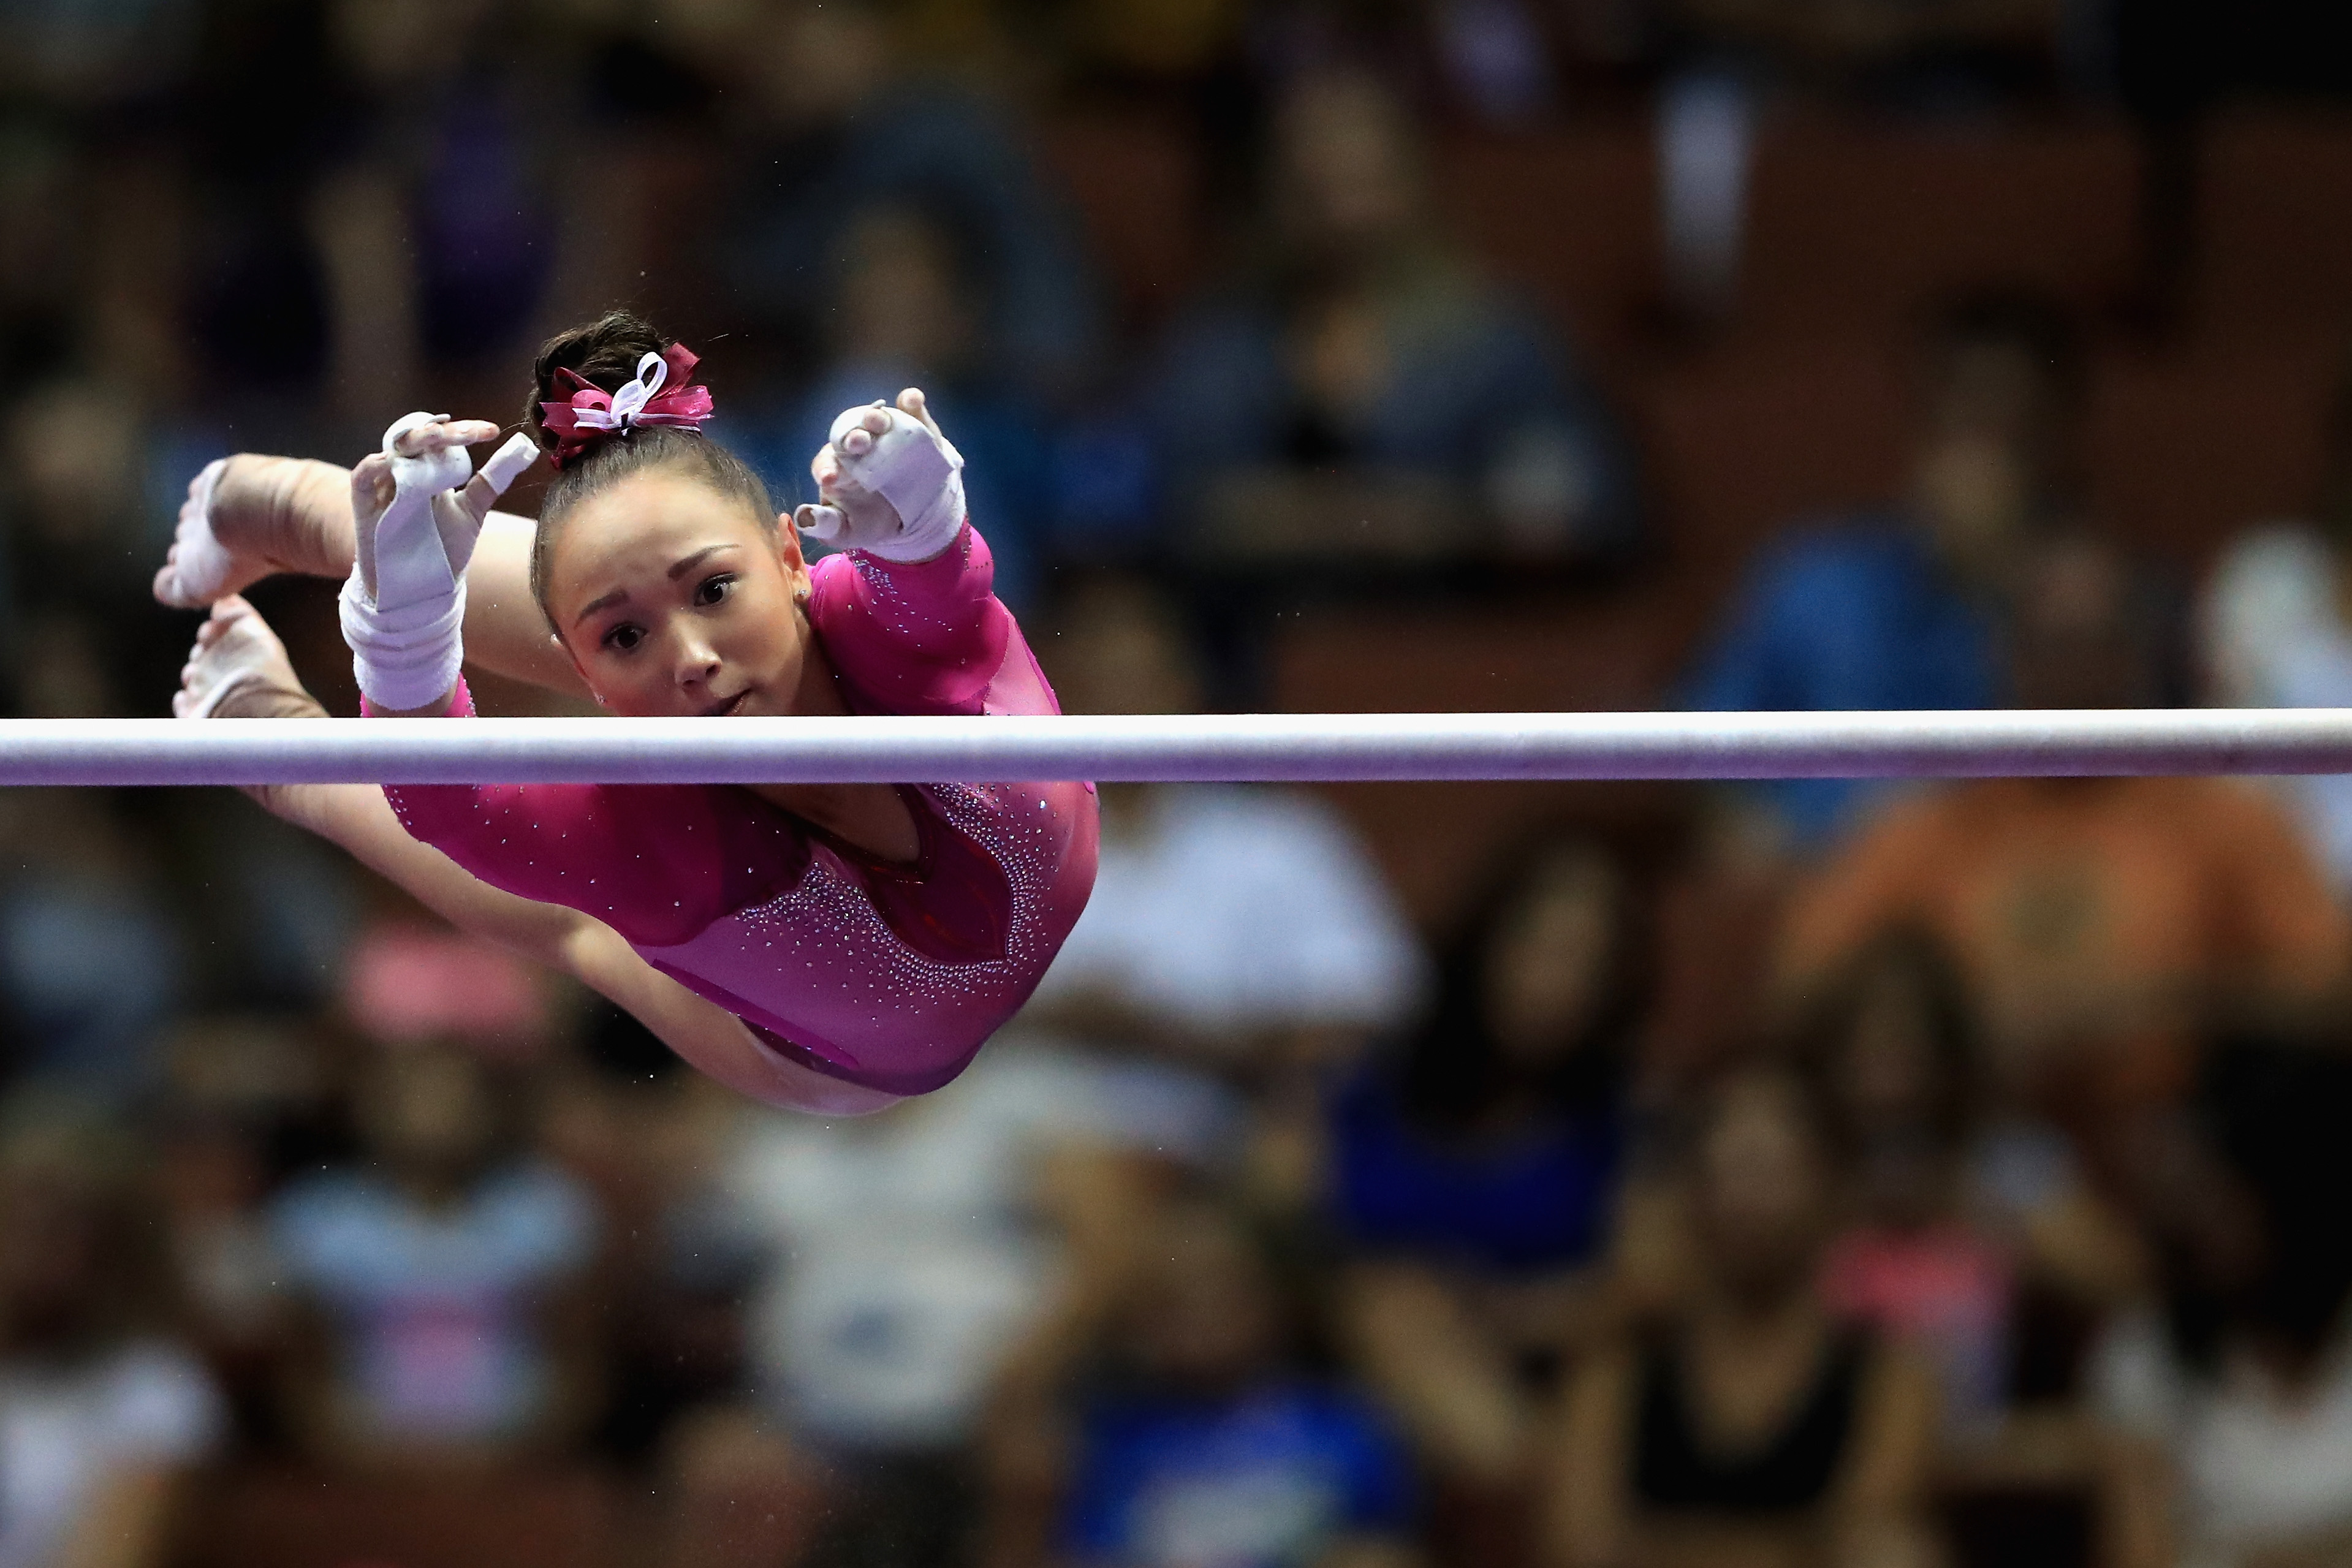 2017 P&G Gymnastics Championships - Day 4